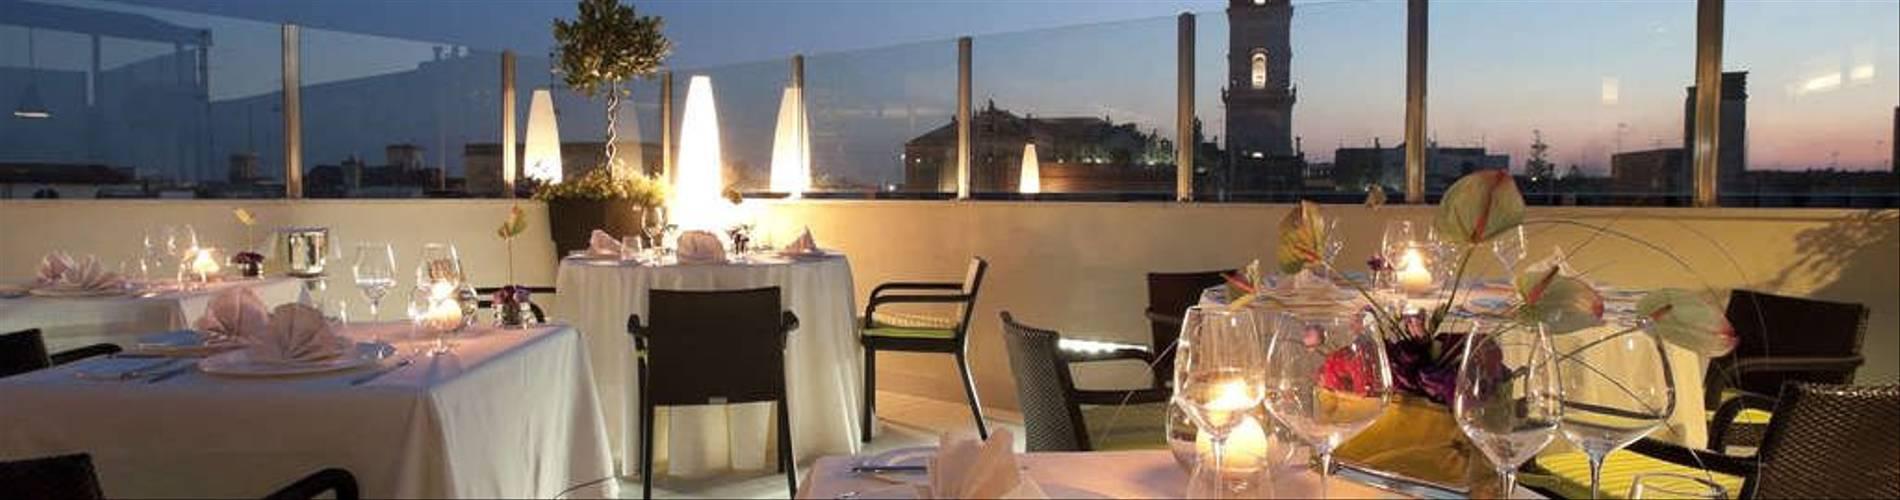 Risorgimento Resort 1.jpg